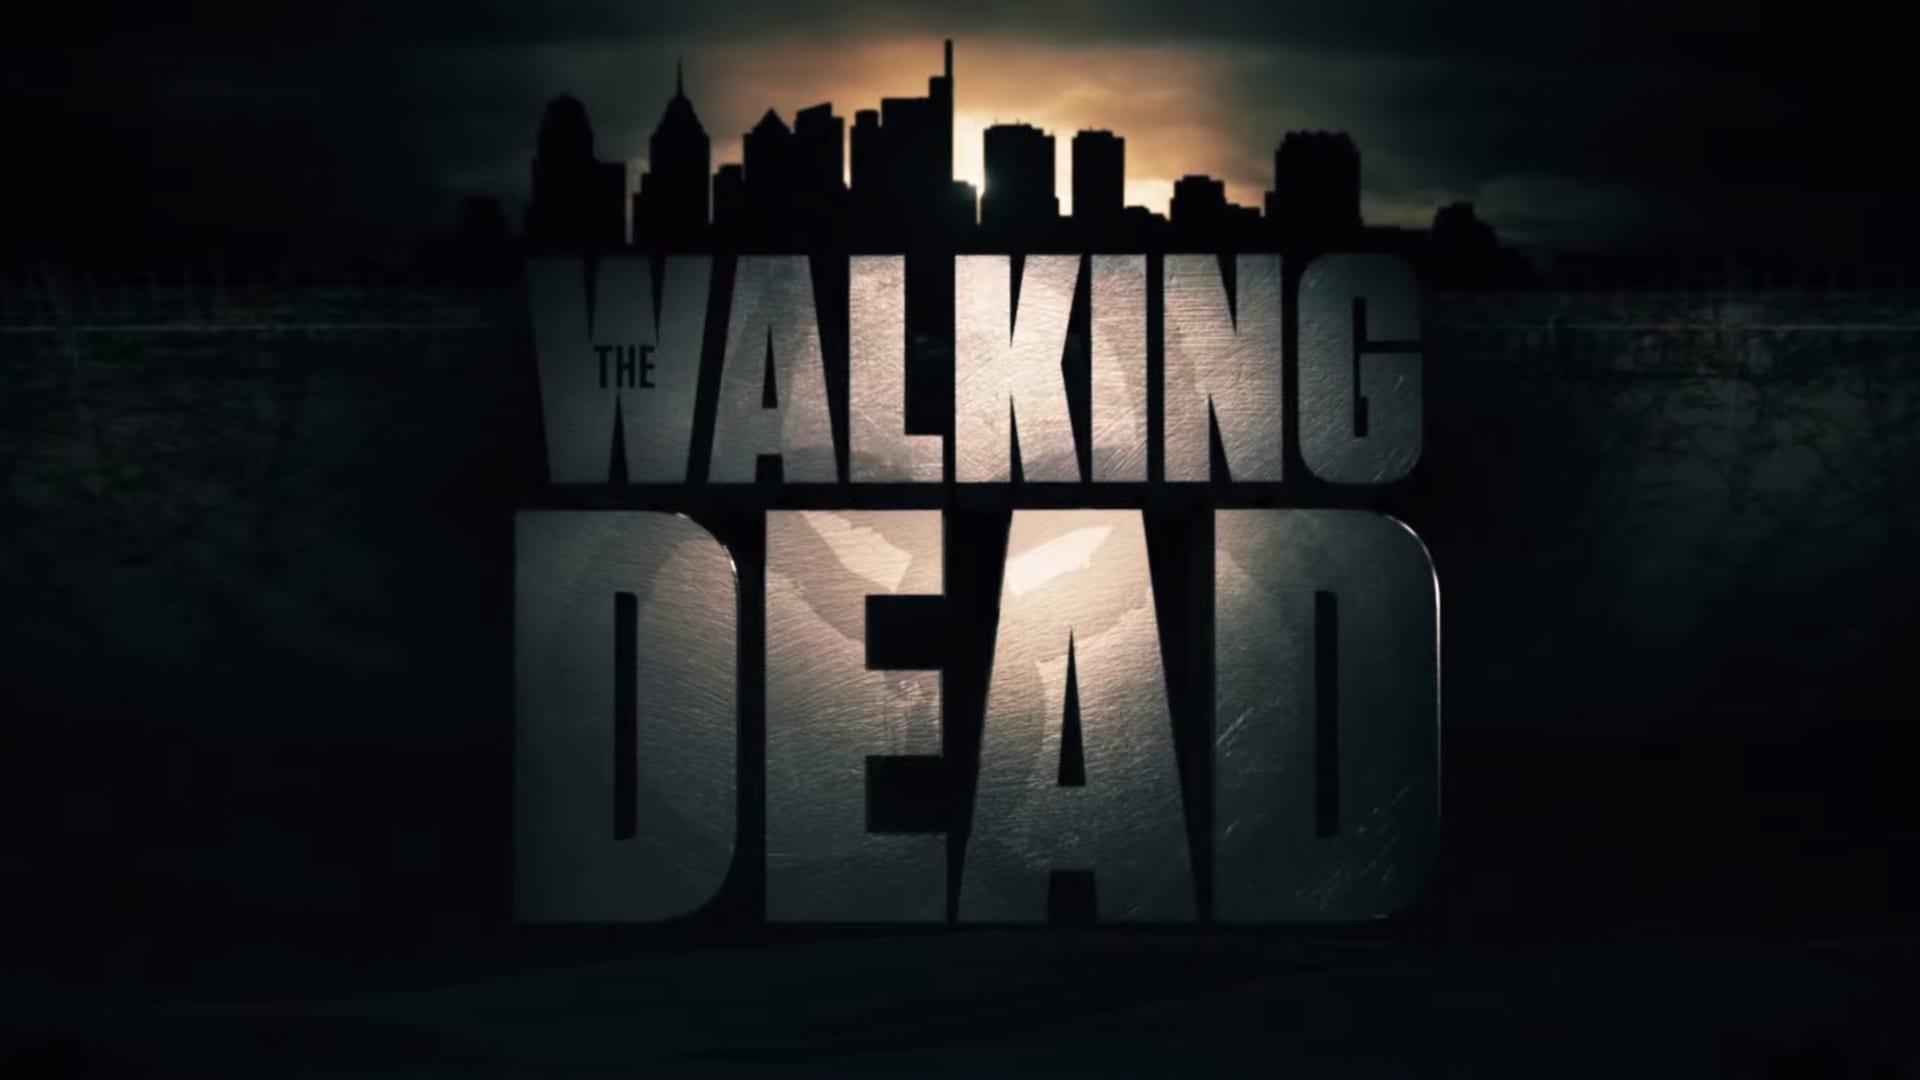 The Walking Dead Movie details